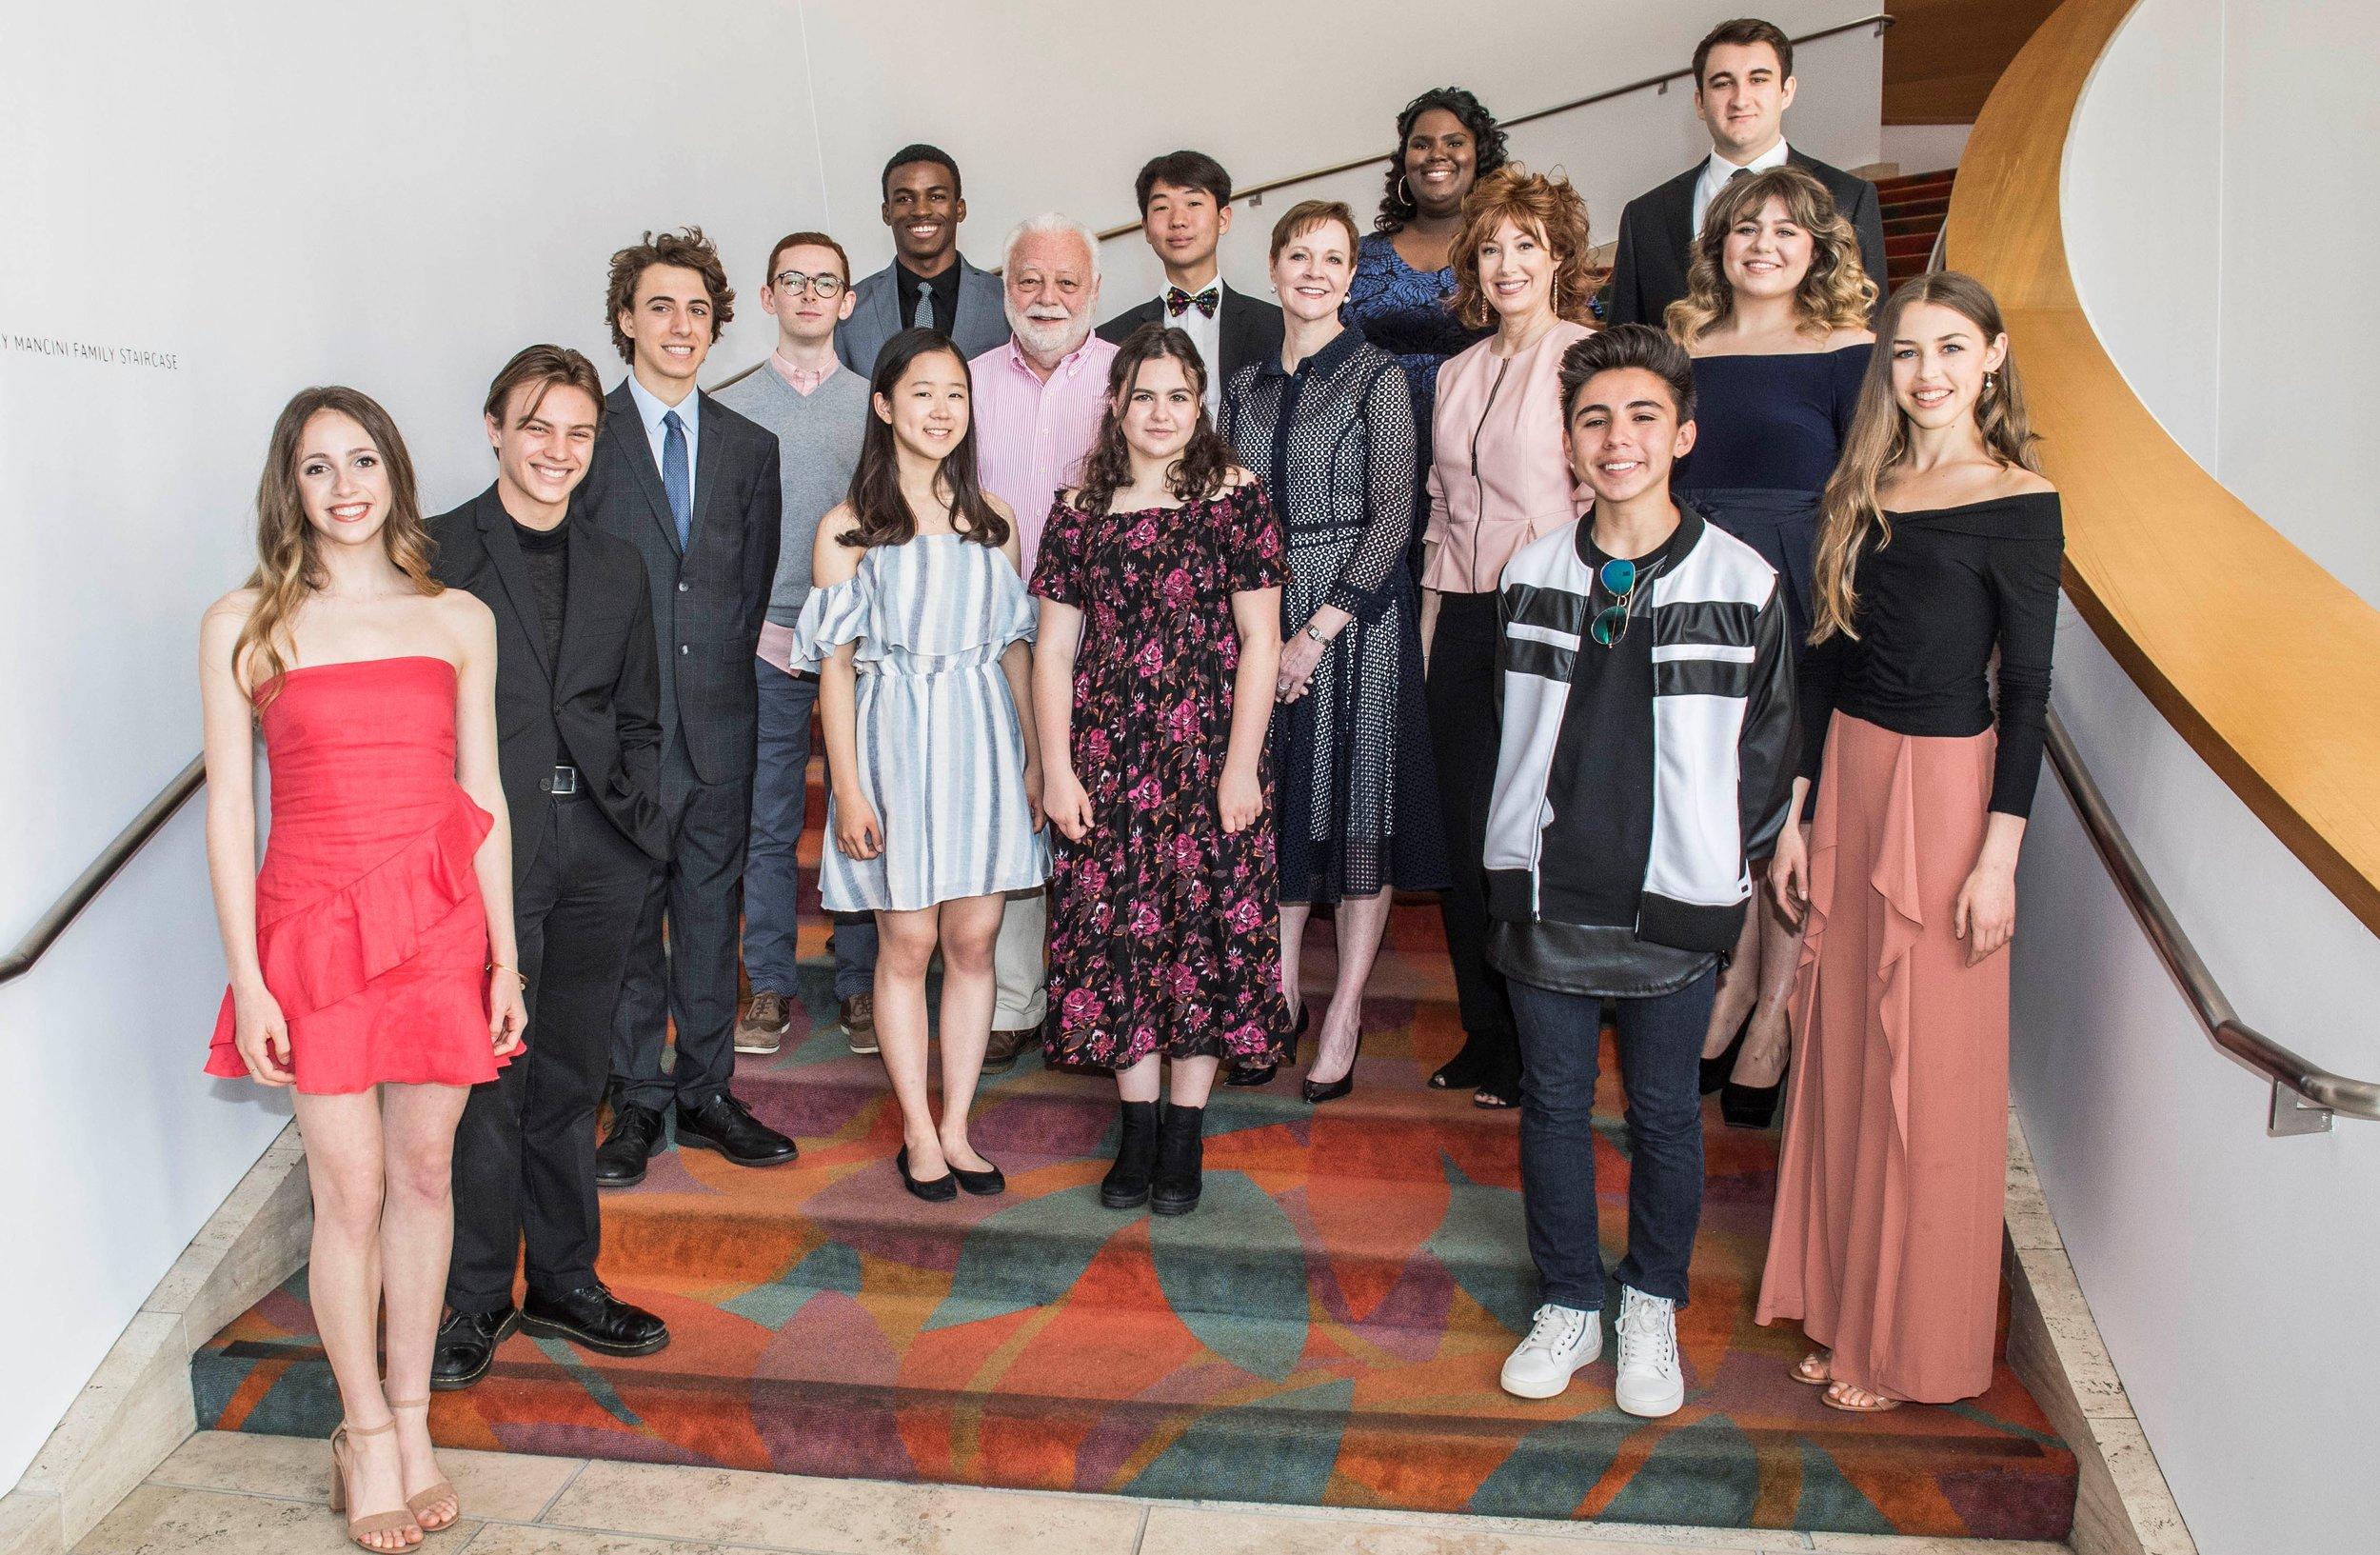 Spotlight's 2018 grand prize finalists. Photo courtesy The Music Center.